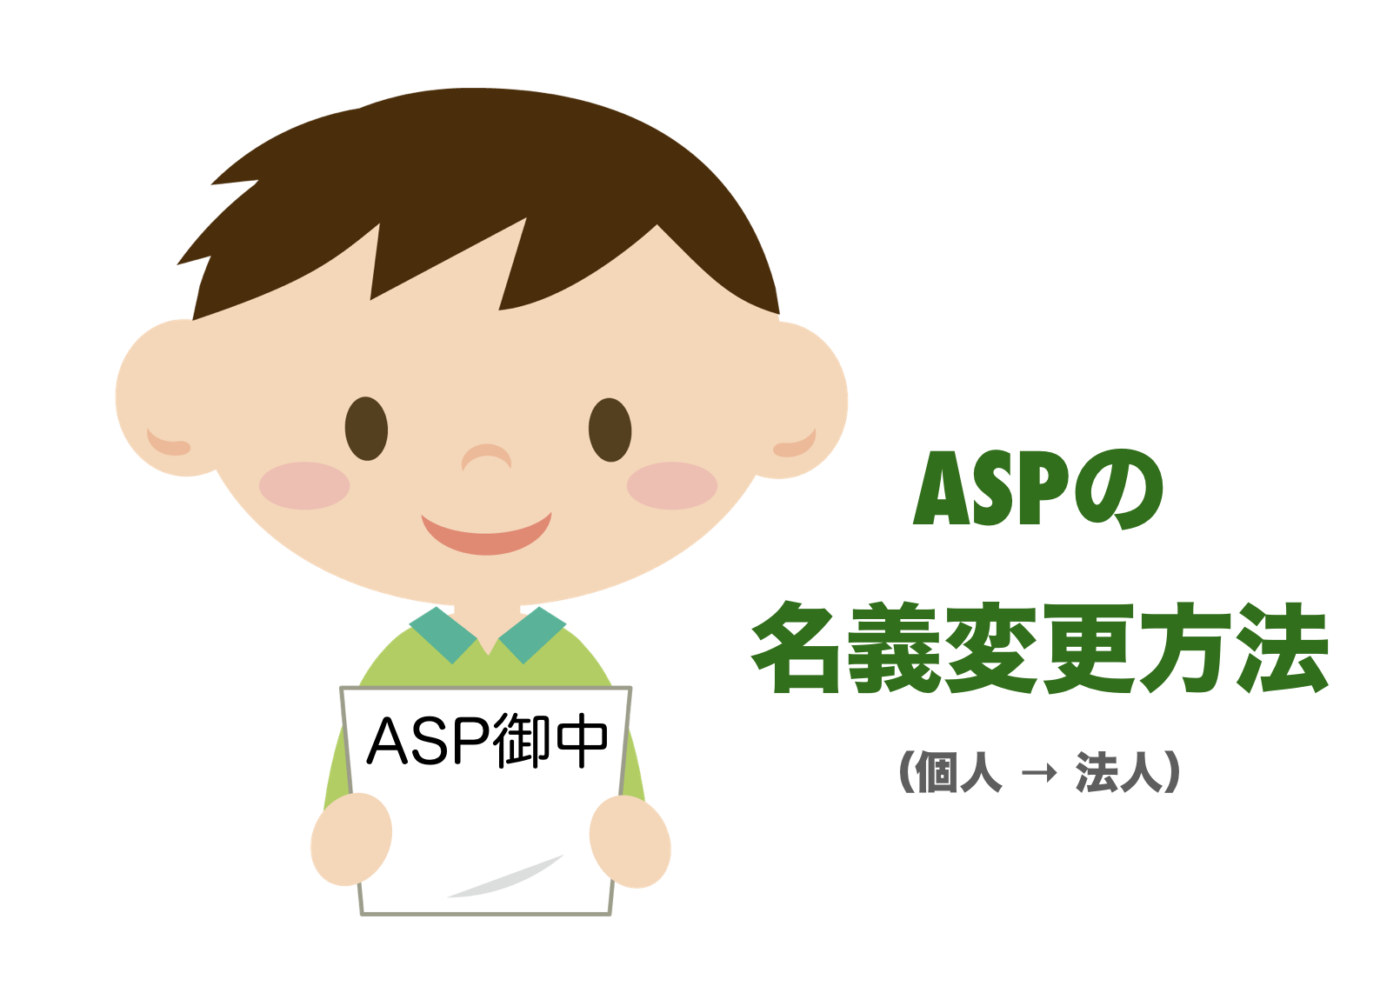 ASP契約名義・振込口座情報を「個人から法人」に変更する方法まとめ